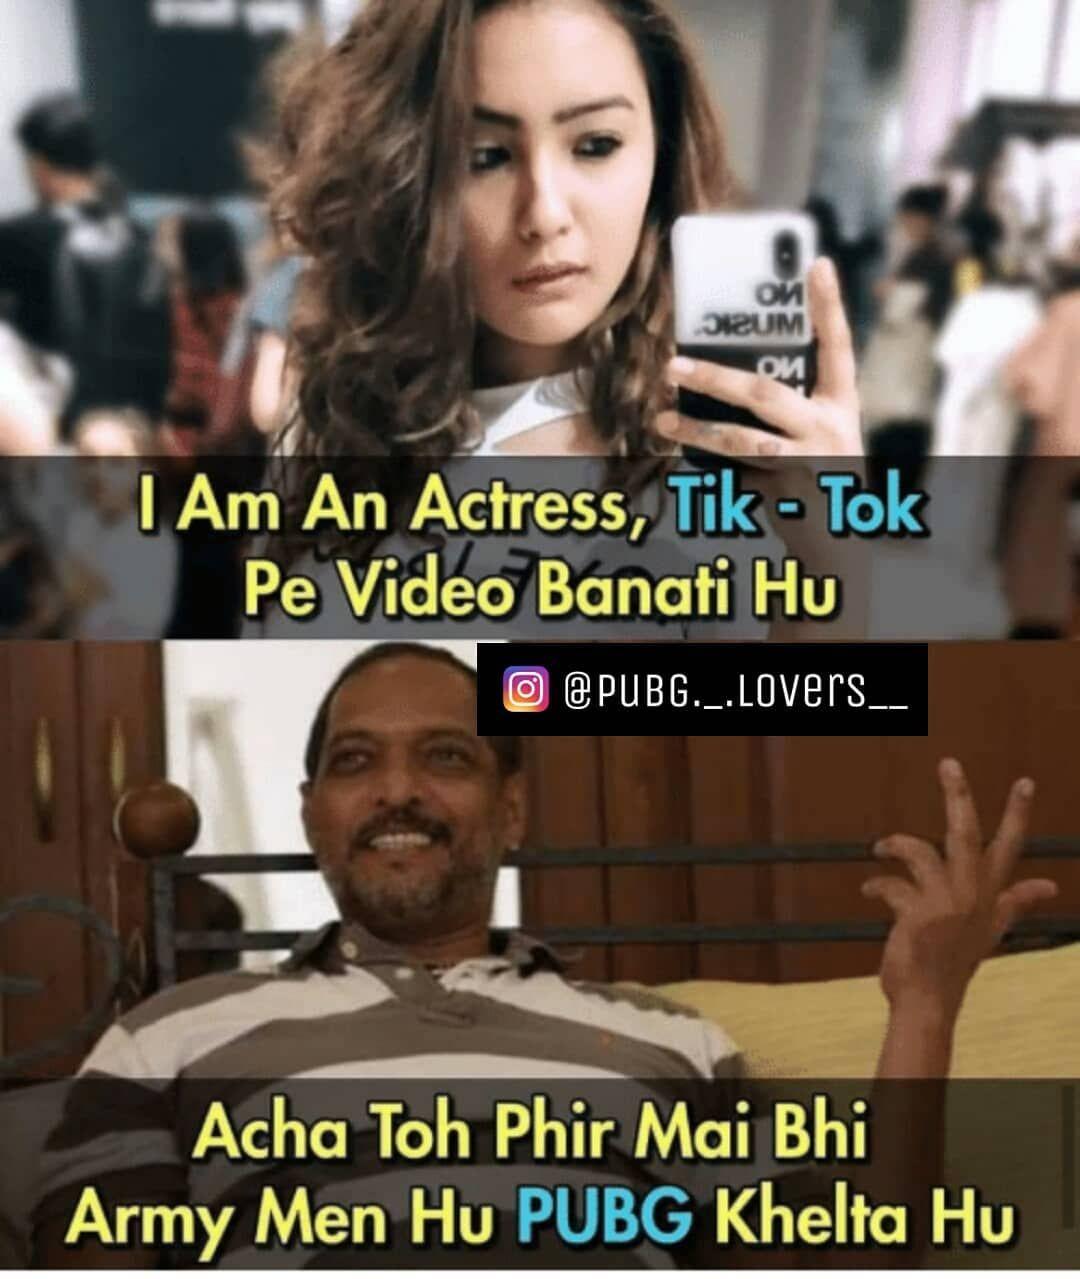 Pubg Memes Jokes In Hindi Jokes Crazy Funny Memes